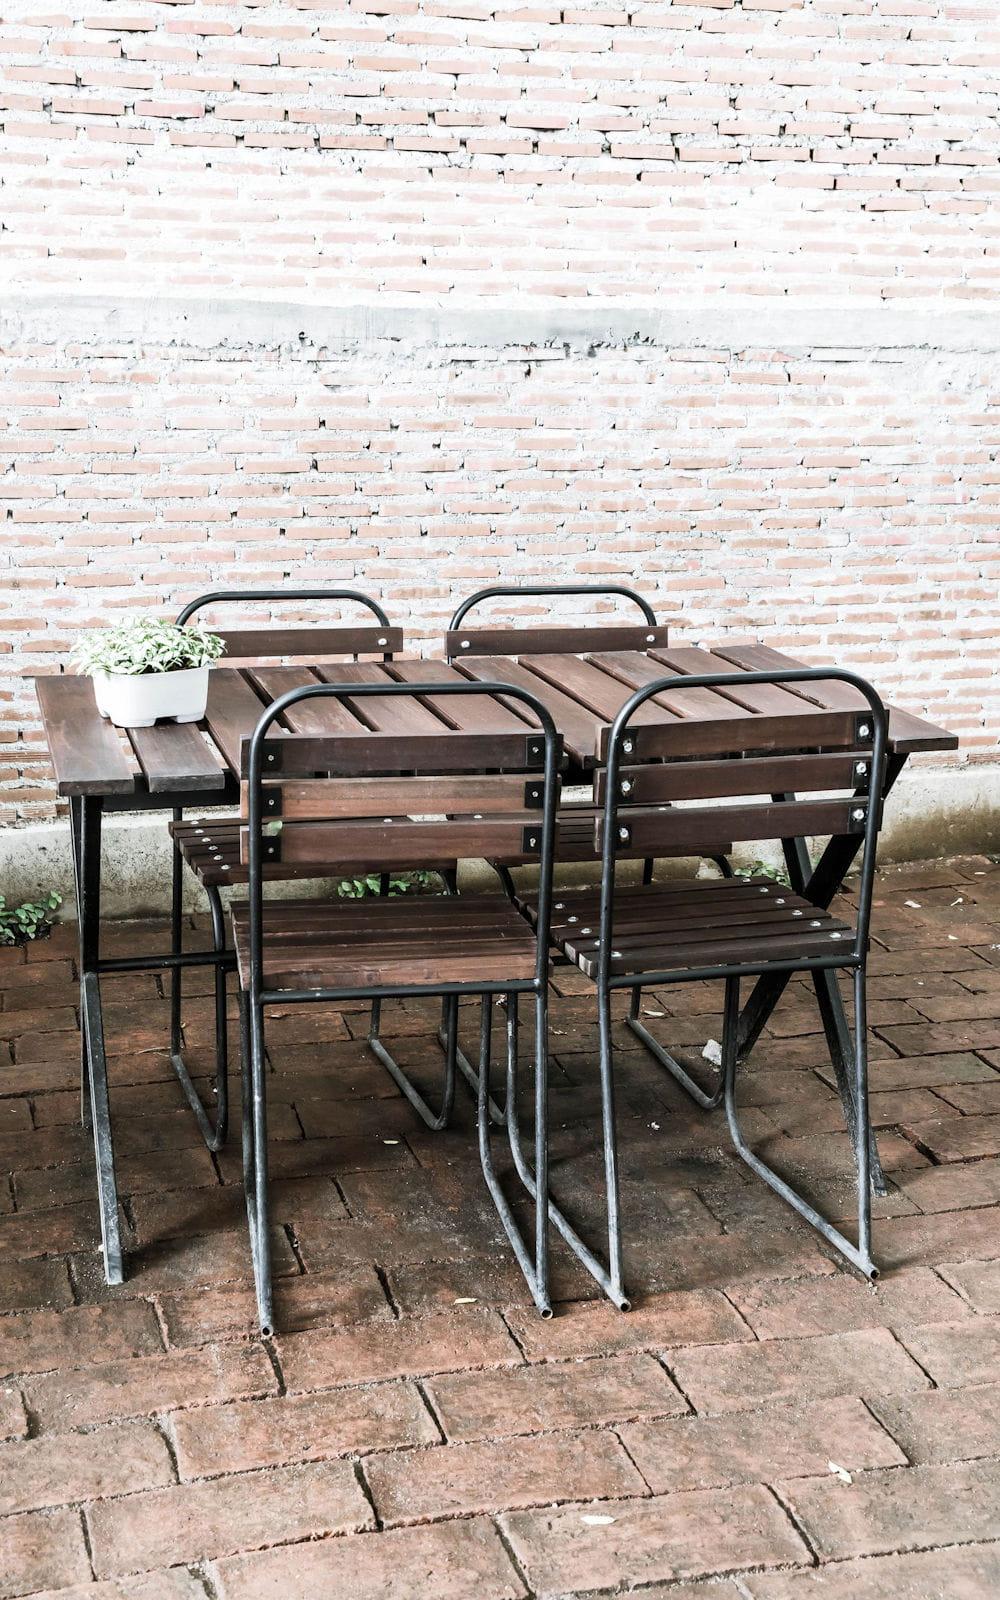 Comment Nettoyer Terrasse Pierre Naturelle nos conseils pour nettoyer sa terrasse ou son balcon